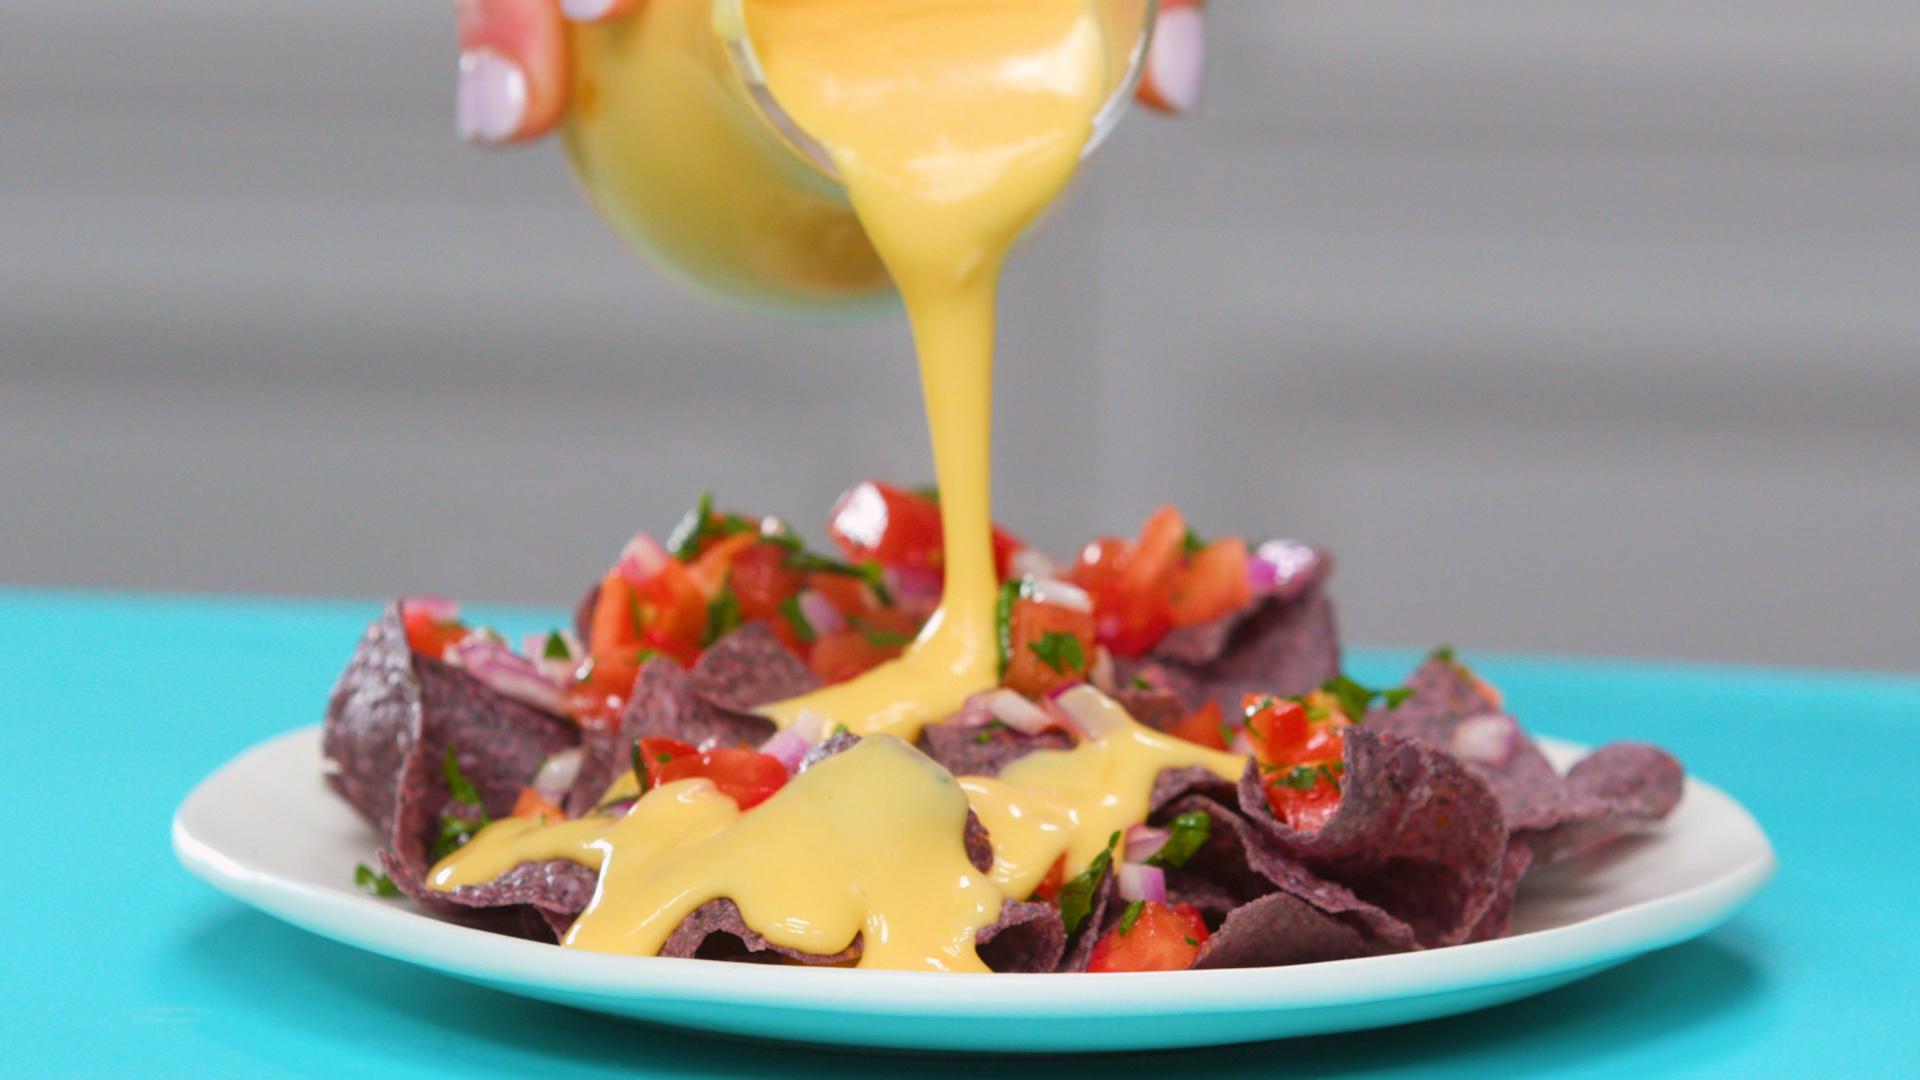 cheddar-cheese-sauce-16x9-Frame.jpg